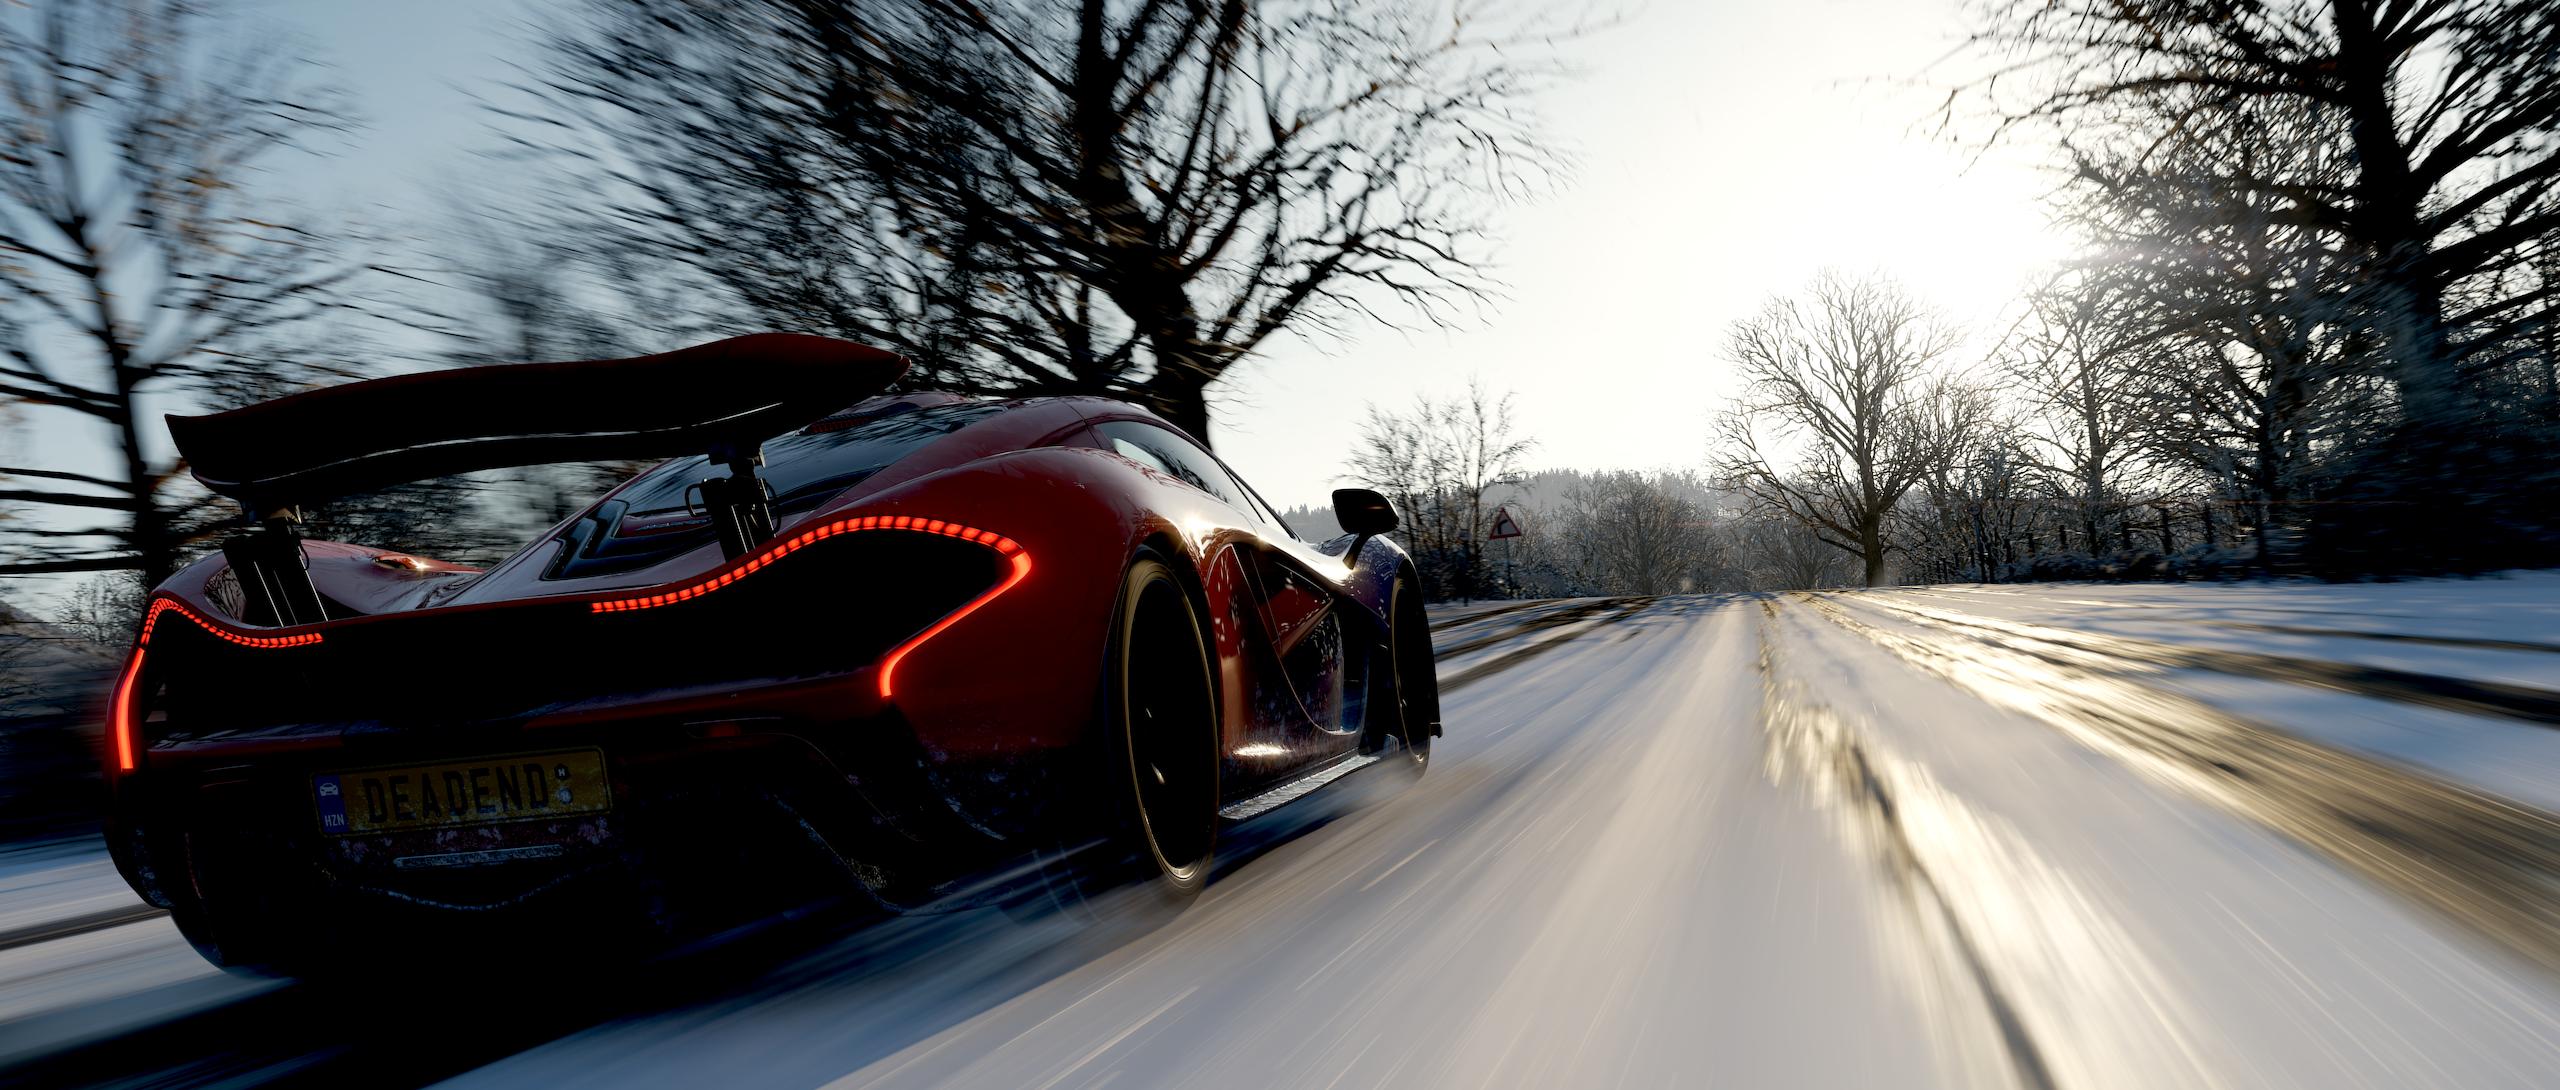 Обзор Forza Horizon 4 - Социалка на колёсах. - Изображение 3